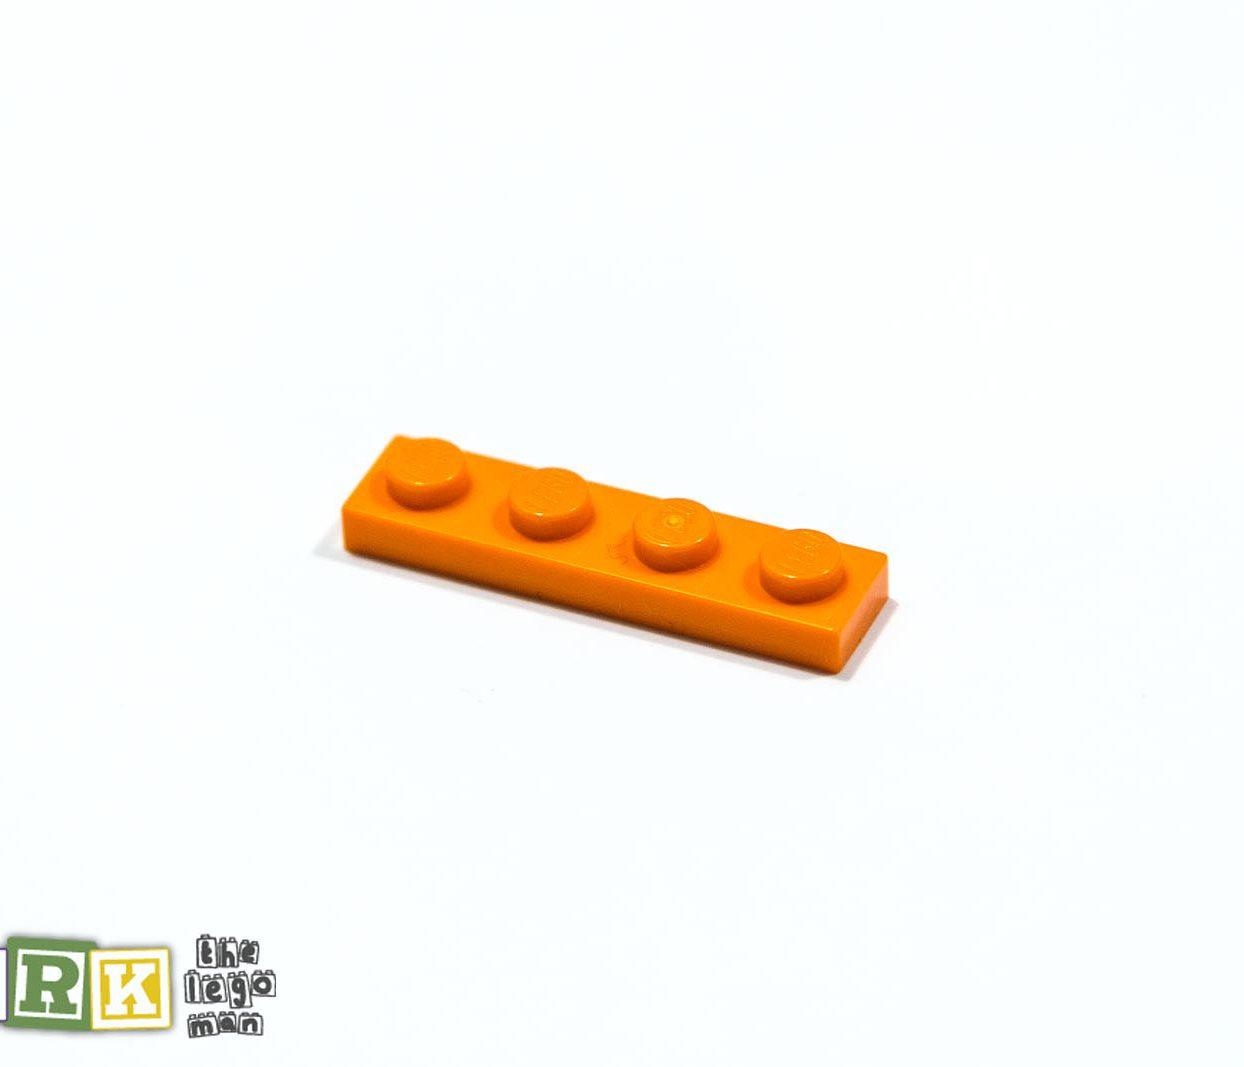 NEW Lego 4118782 3710 1x Bright Orange 1x4 Plate